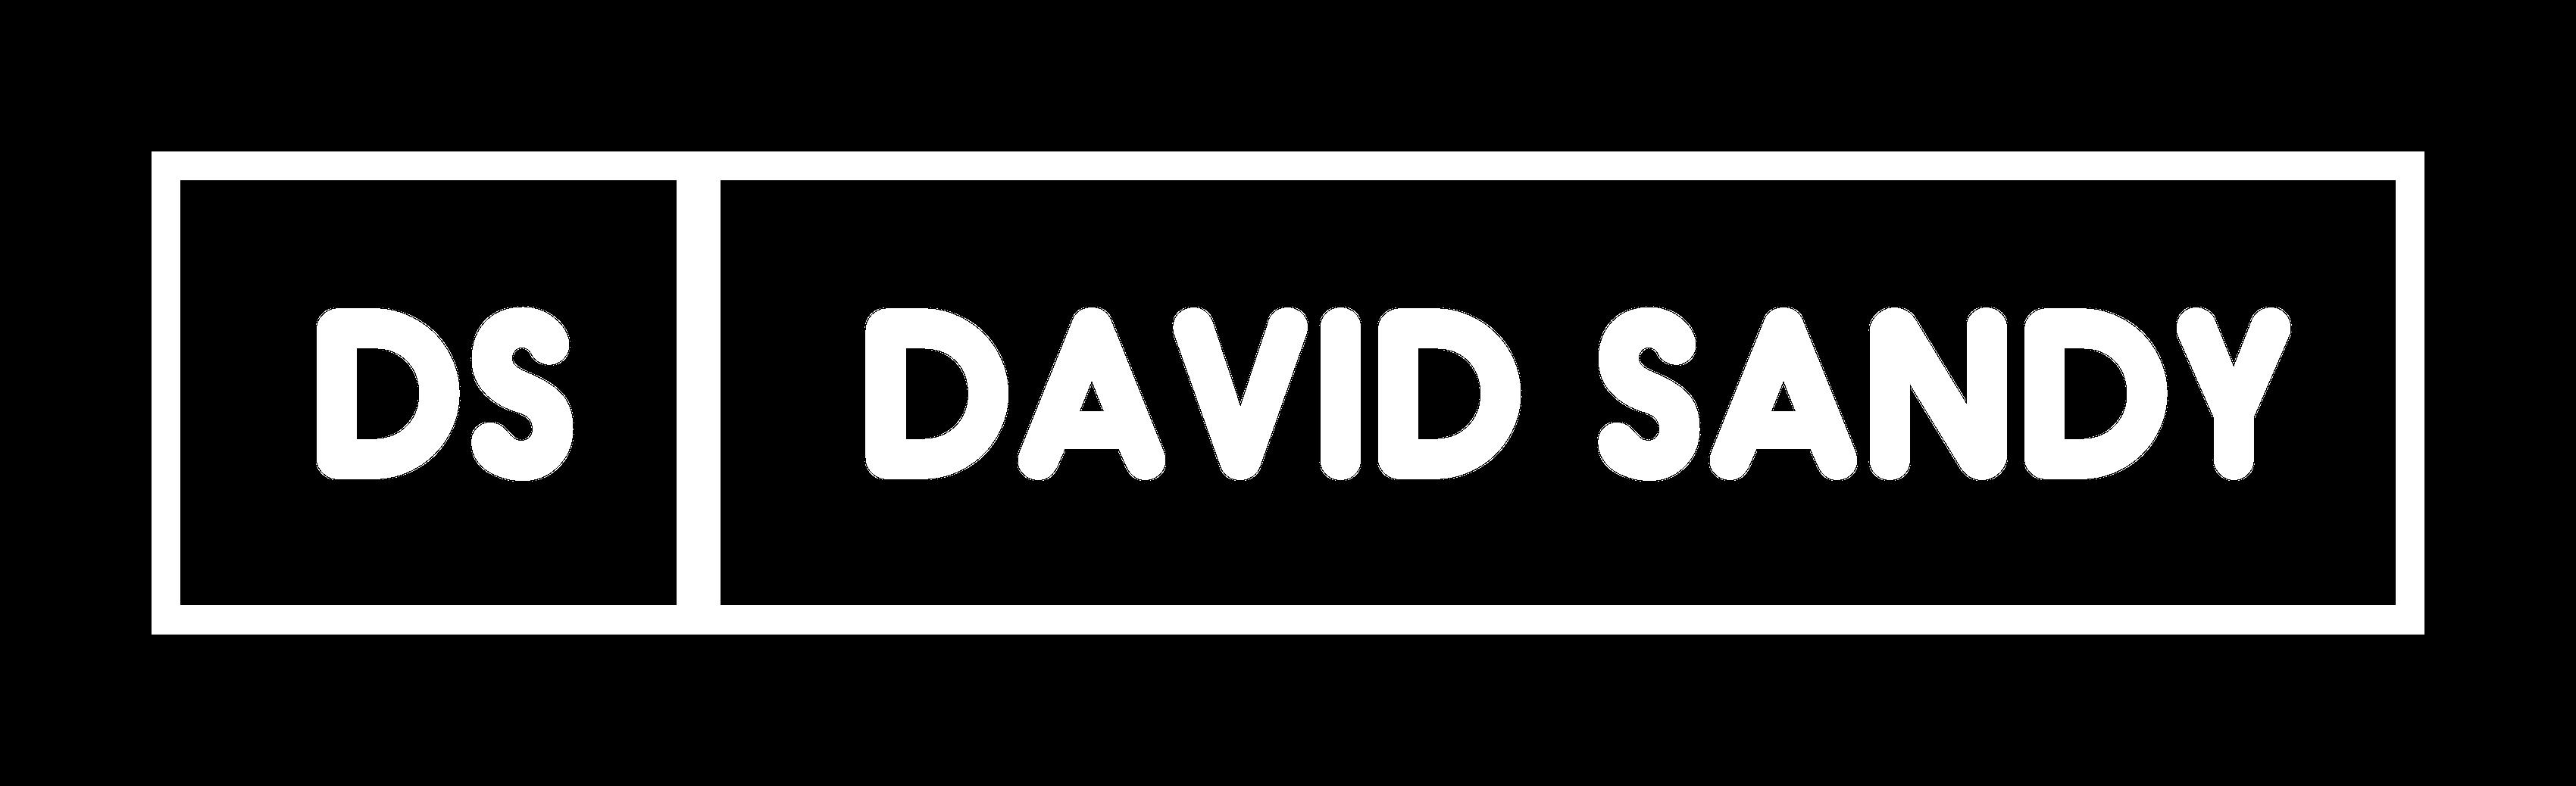 David Sandy